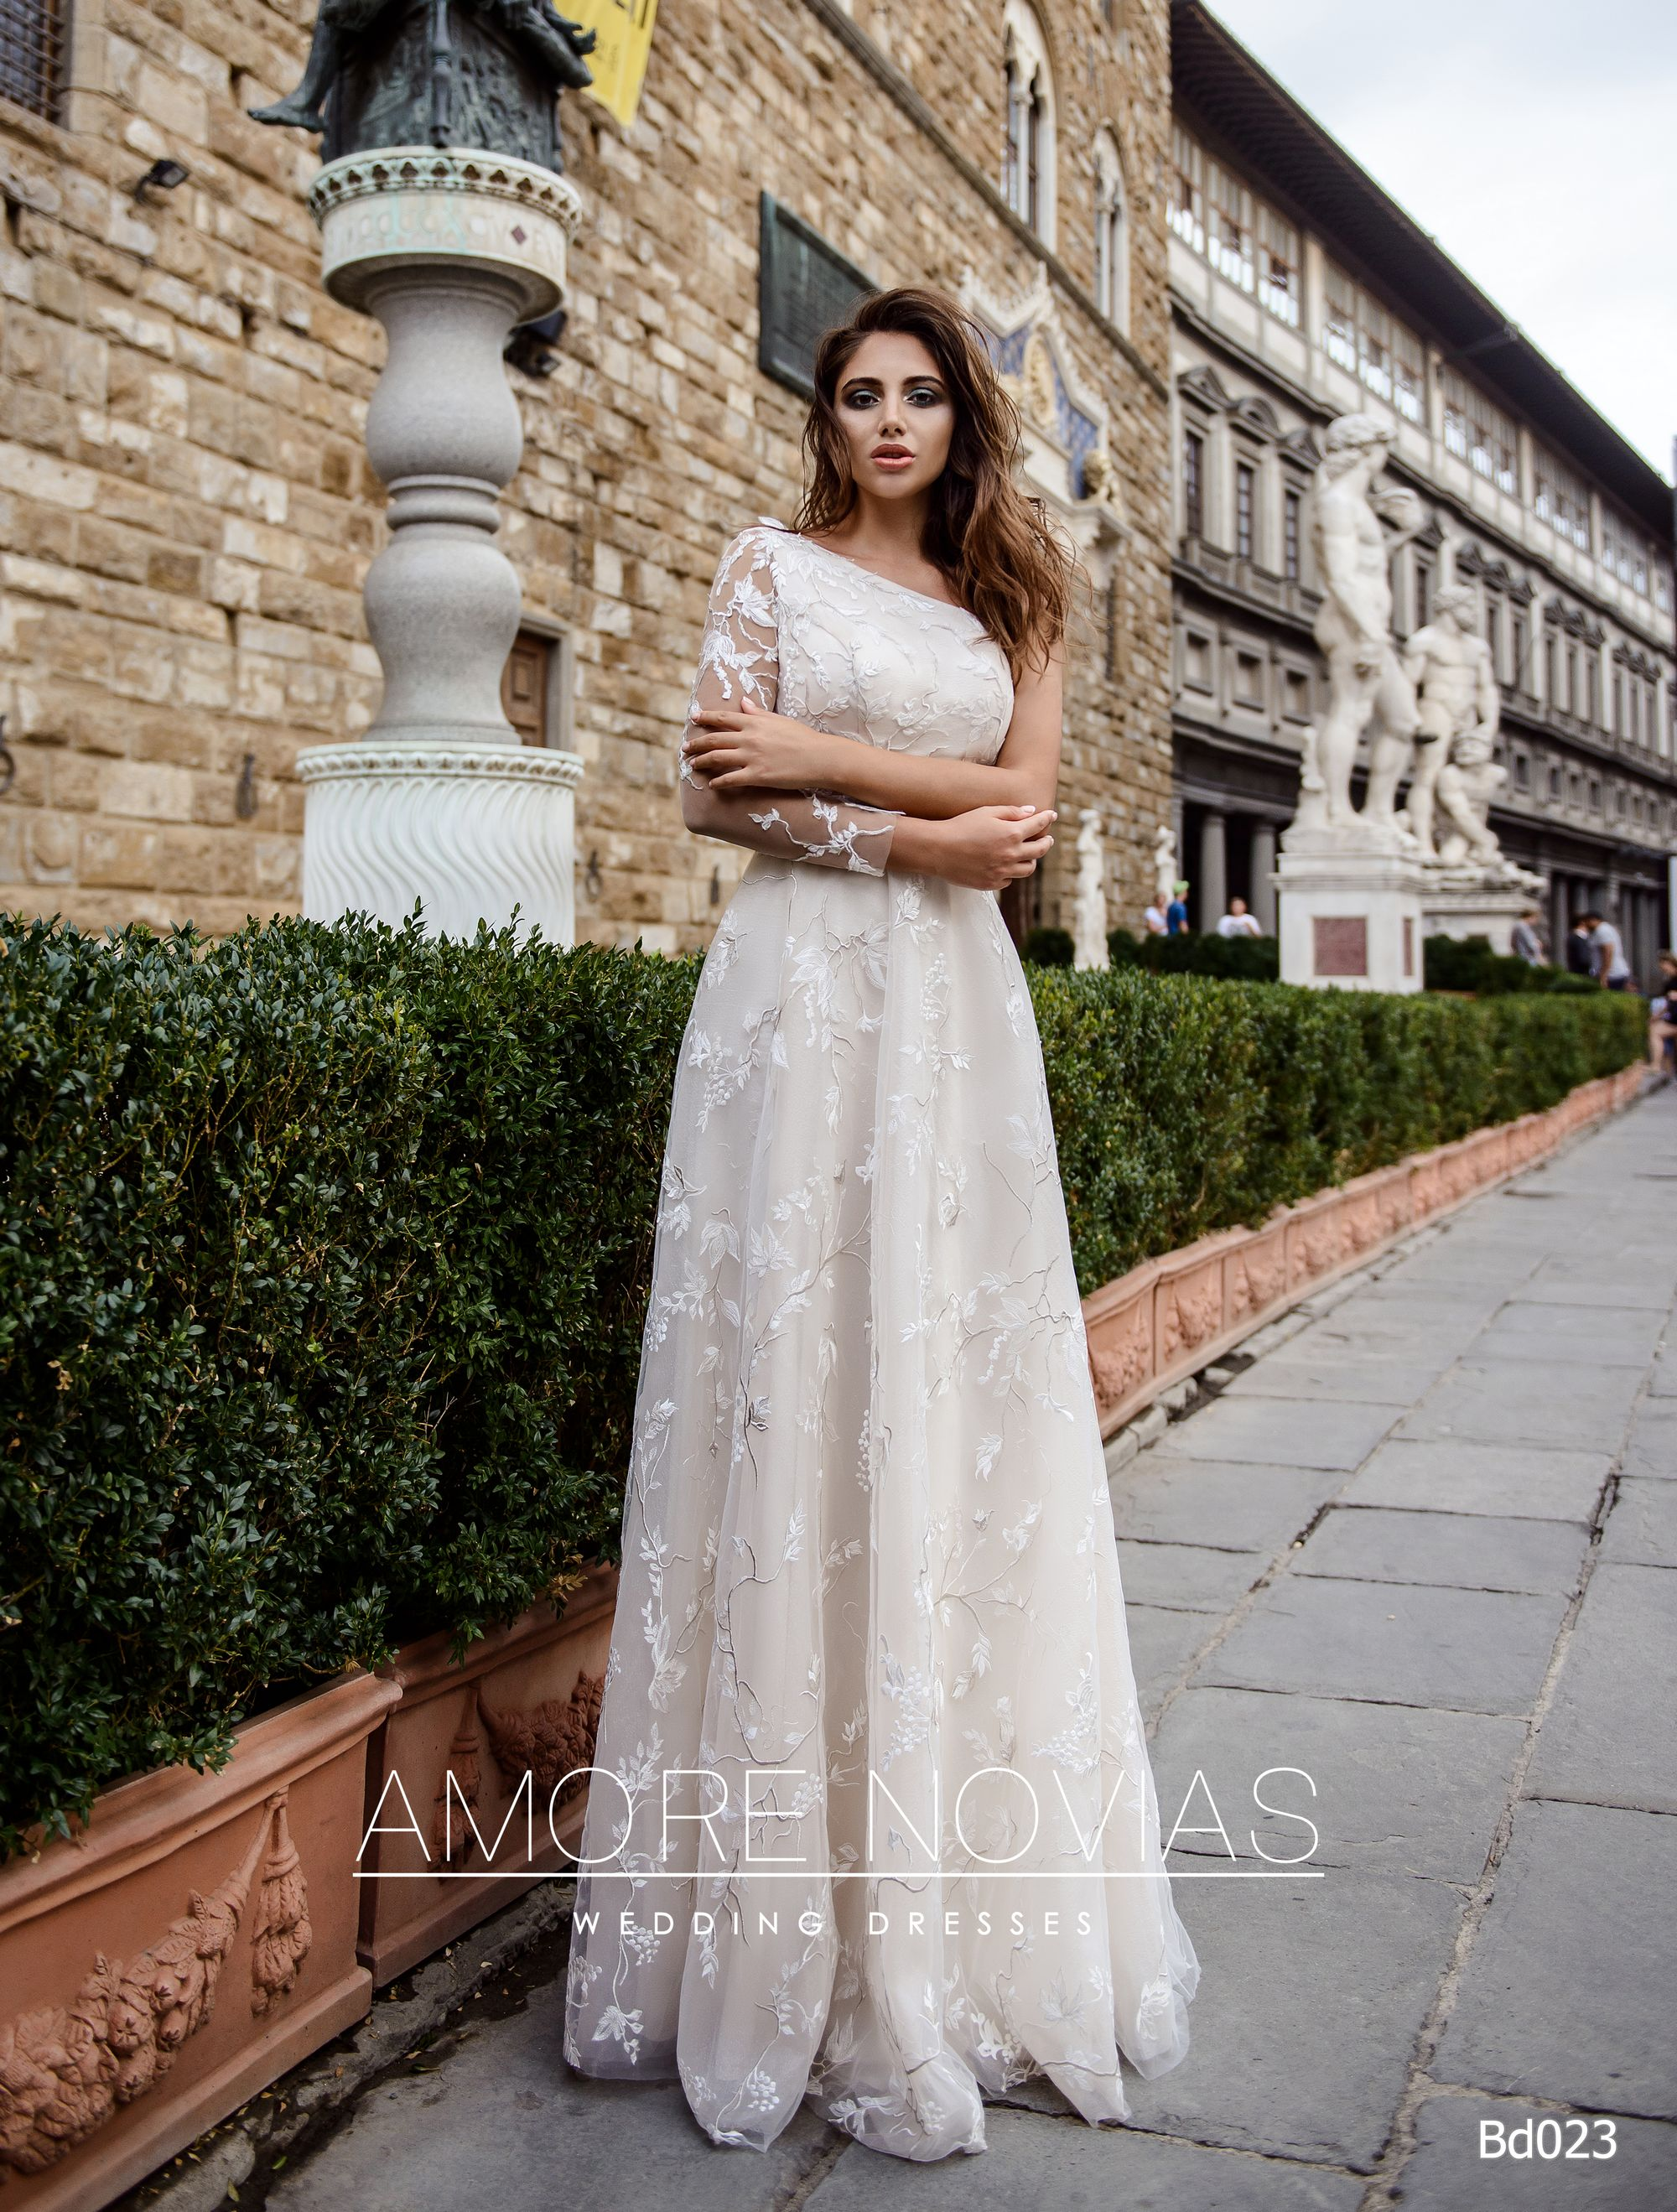 https://amore-novias.com/images/stories/virtuemart/product/bd023-------(1).jpg